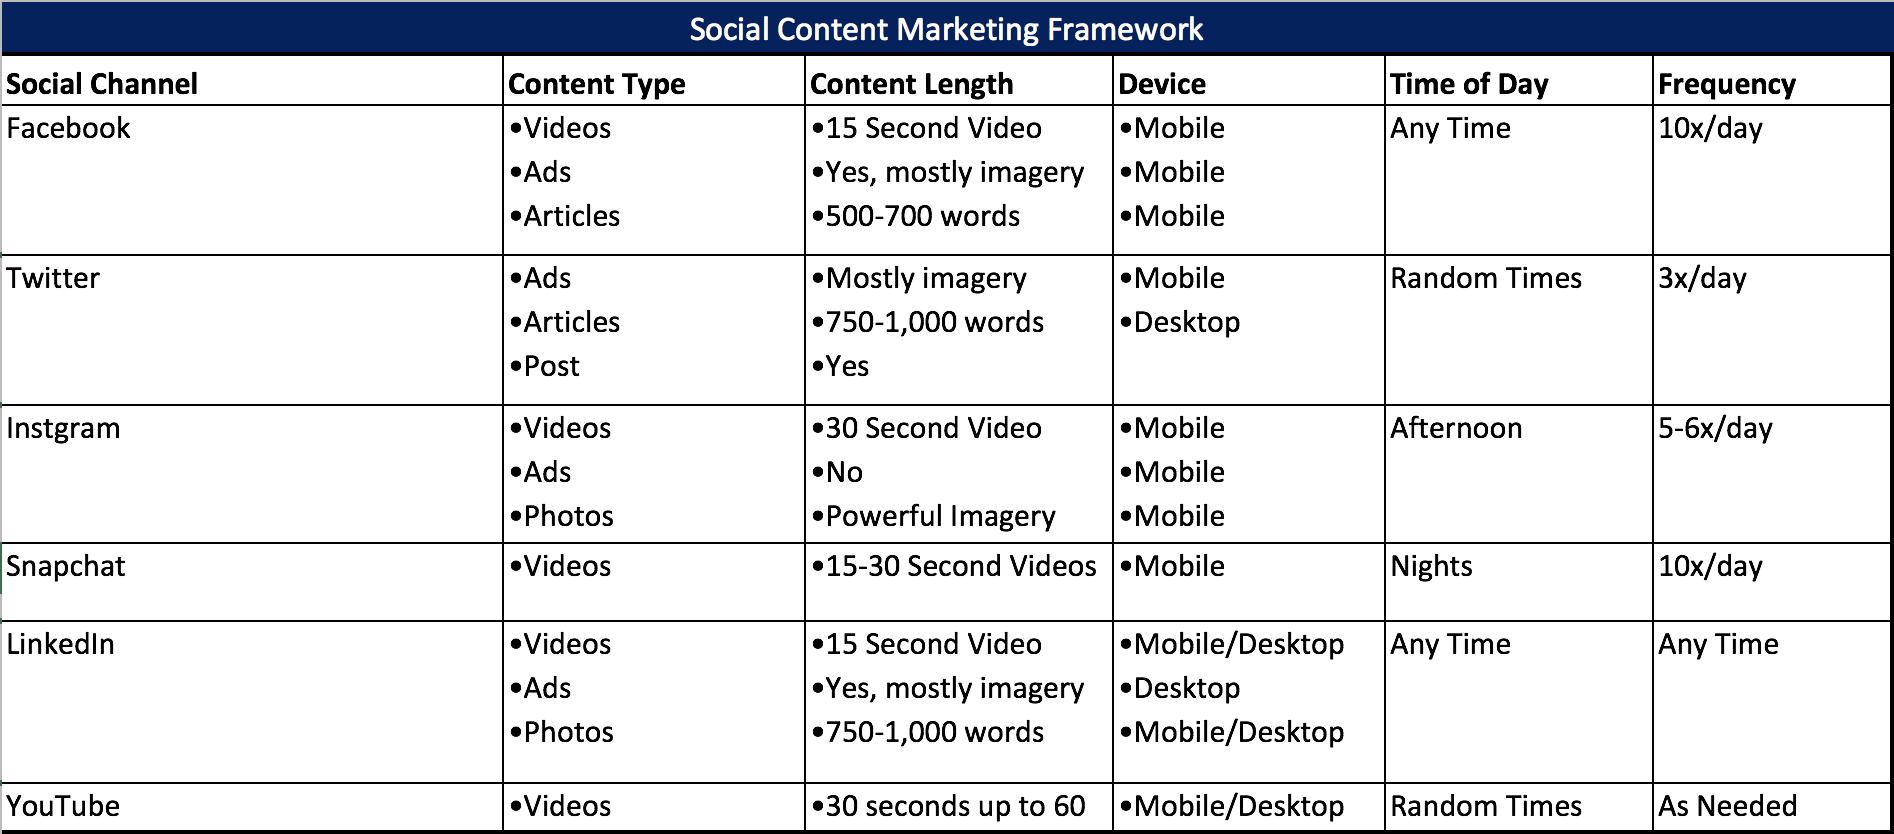 Social Content Framework